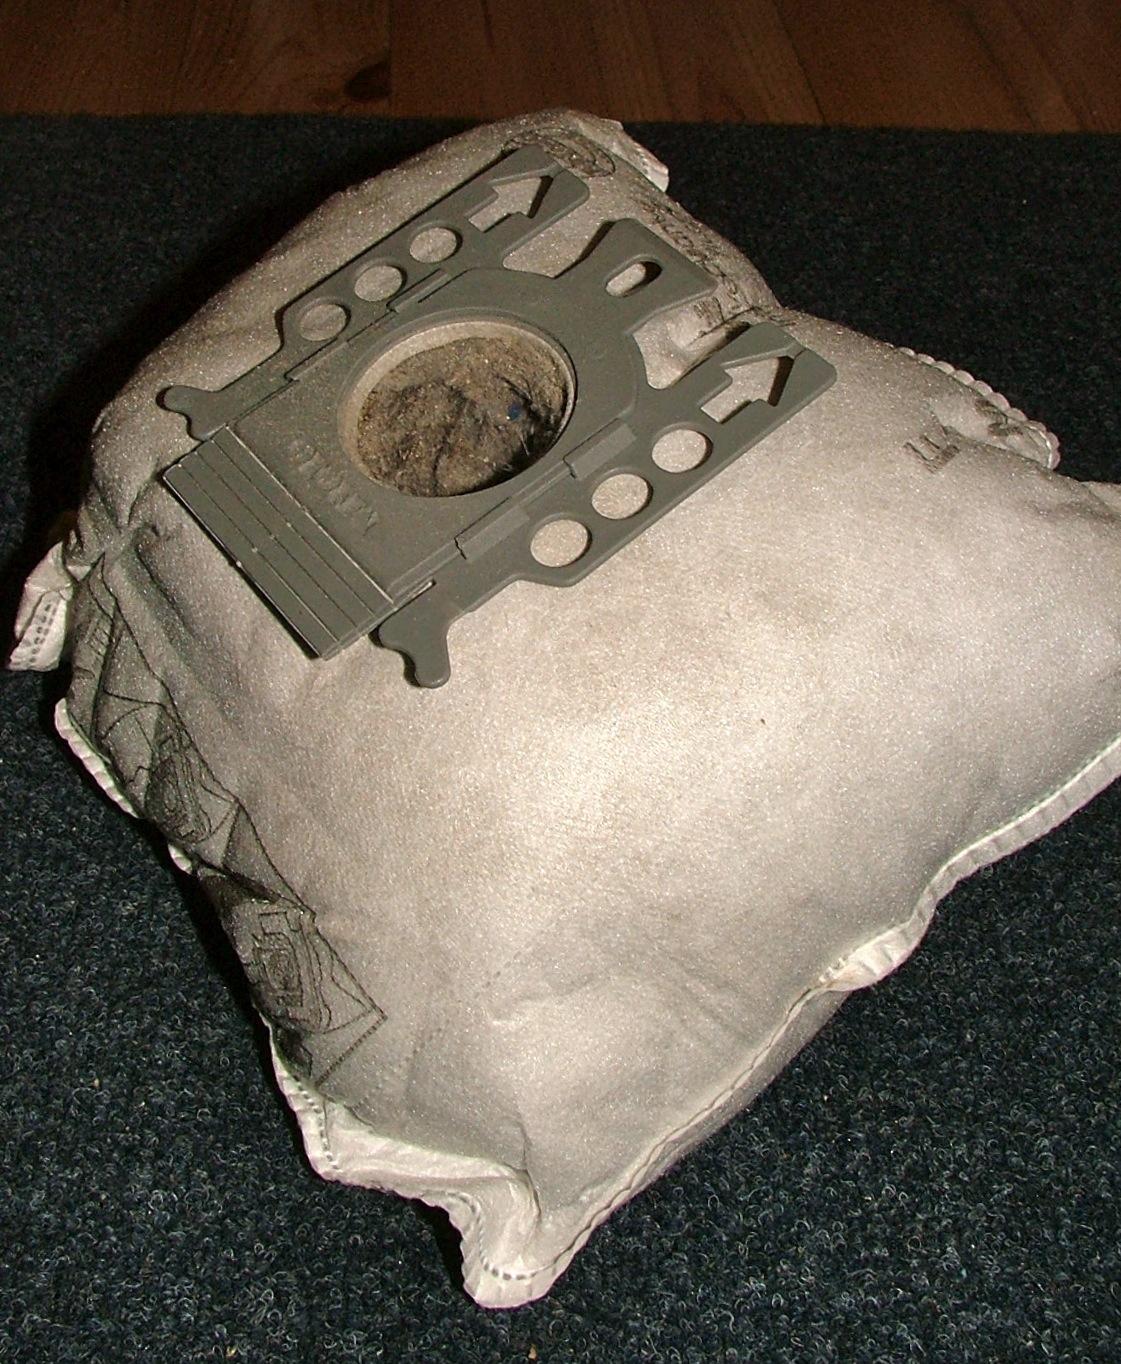 FileVacuum Cleaner Bag